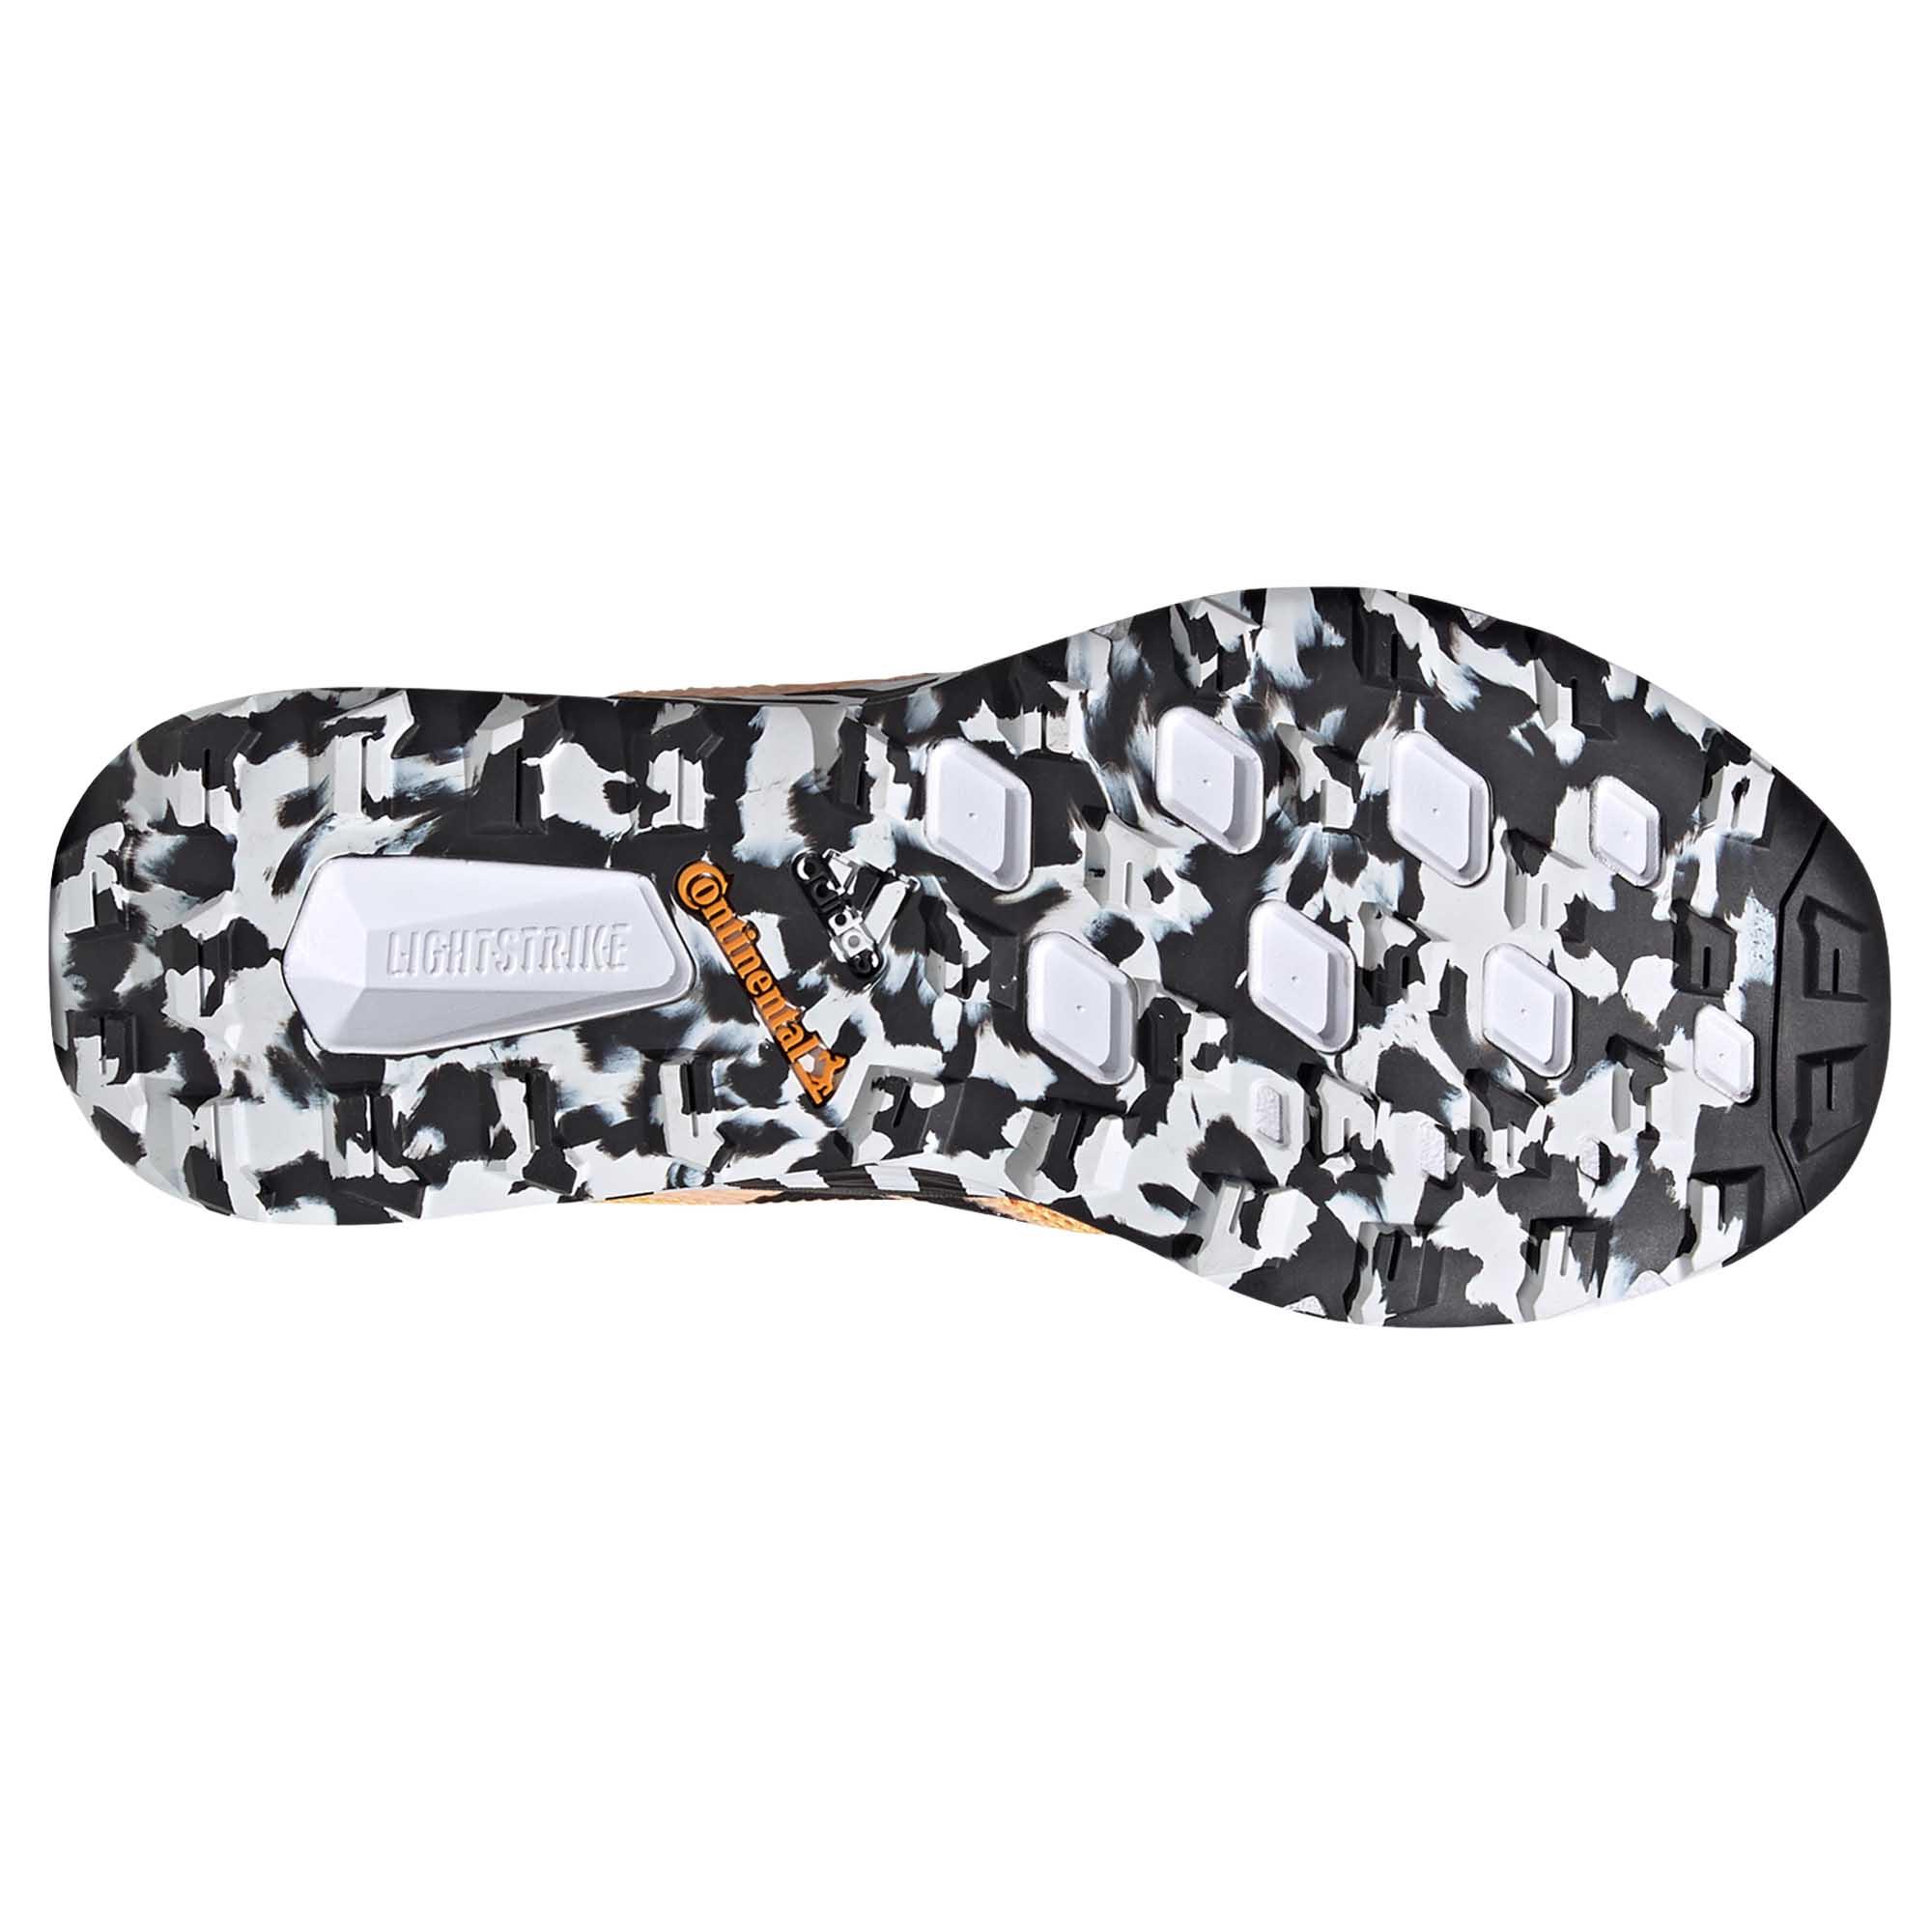 miniature 7 - Adidas-Terrex-deux-homme-trail-running-Trainer-Shoe-Or-Noir-Blanc